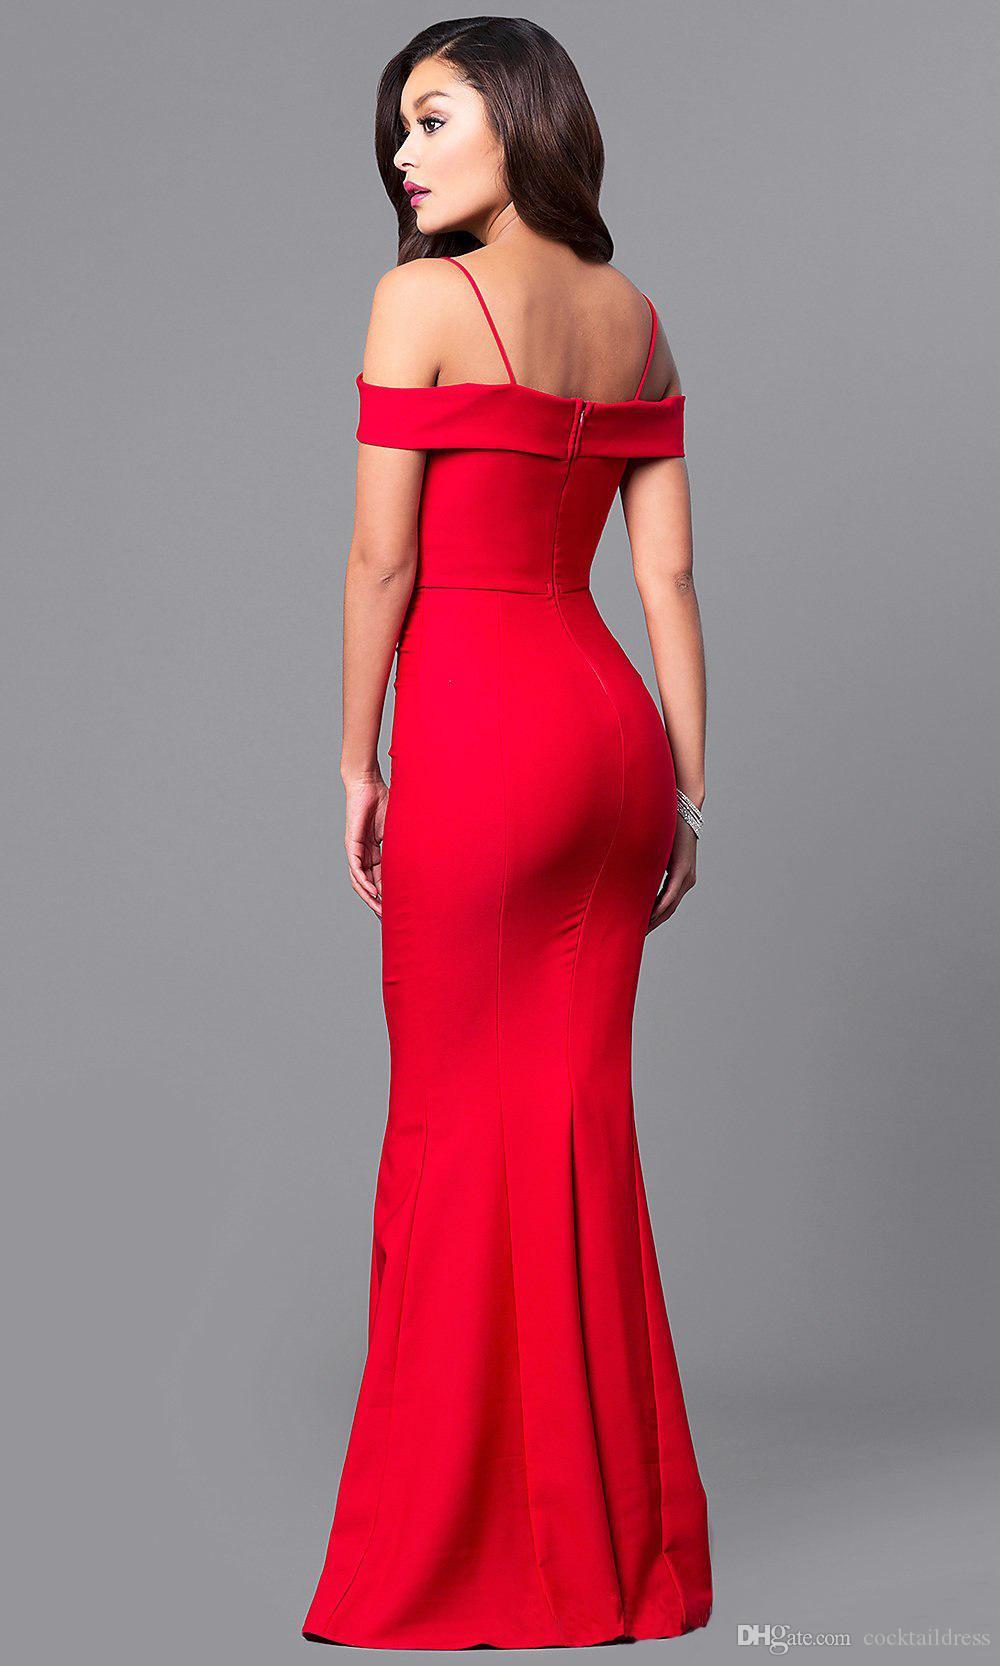 Venda Red Sereia Vestido de Noite Multiway Mangas Tampadas e Trumpet Flare Hem, Sexy Fit n Flare Burlesco Pin Up Vestido